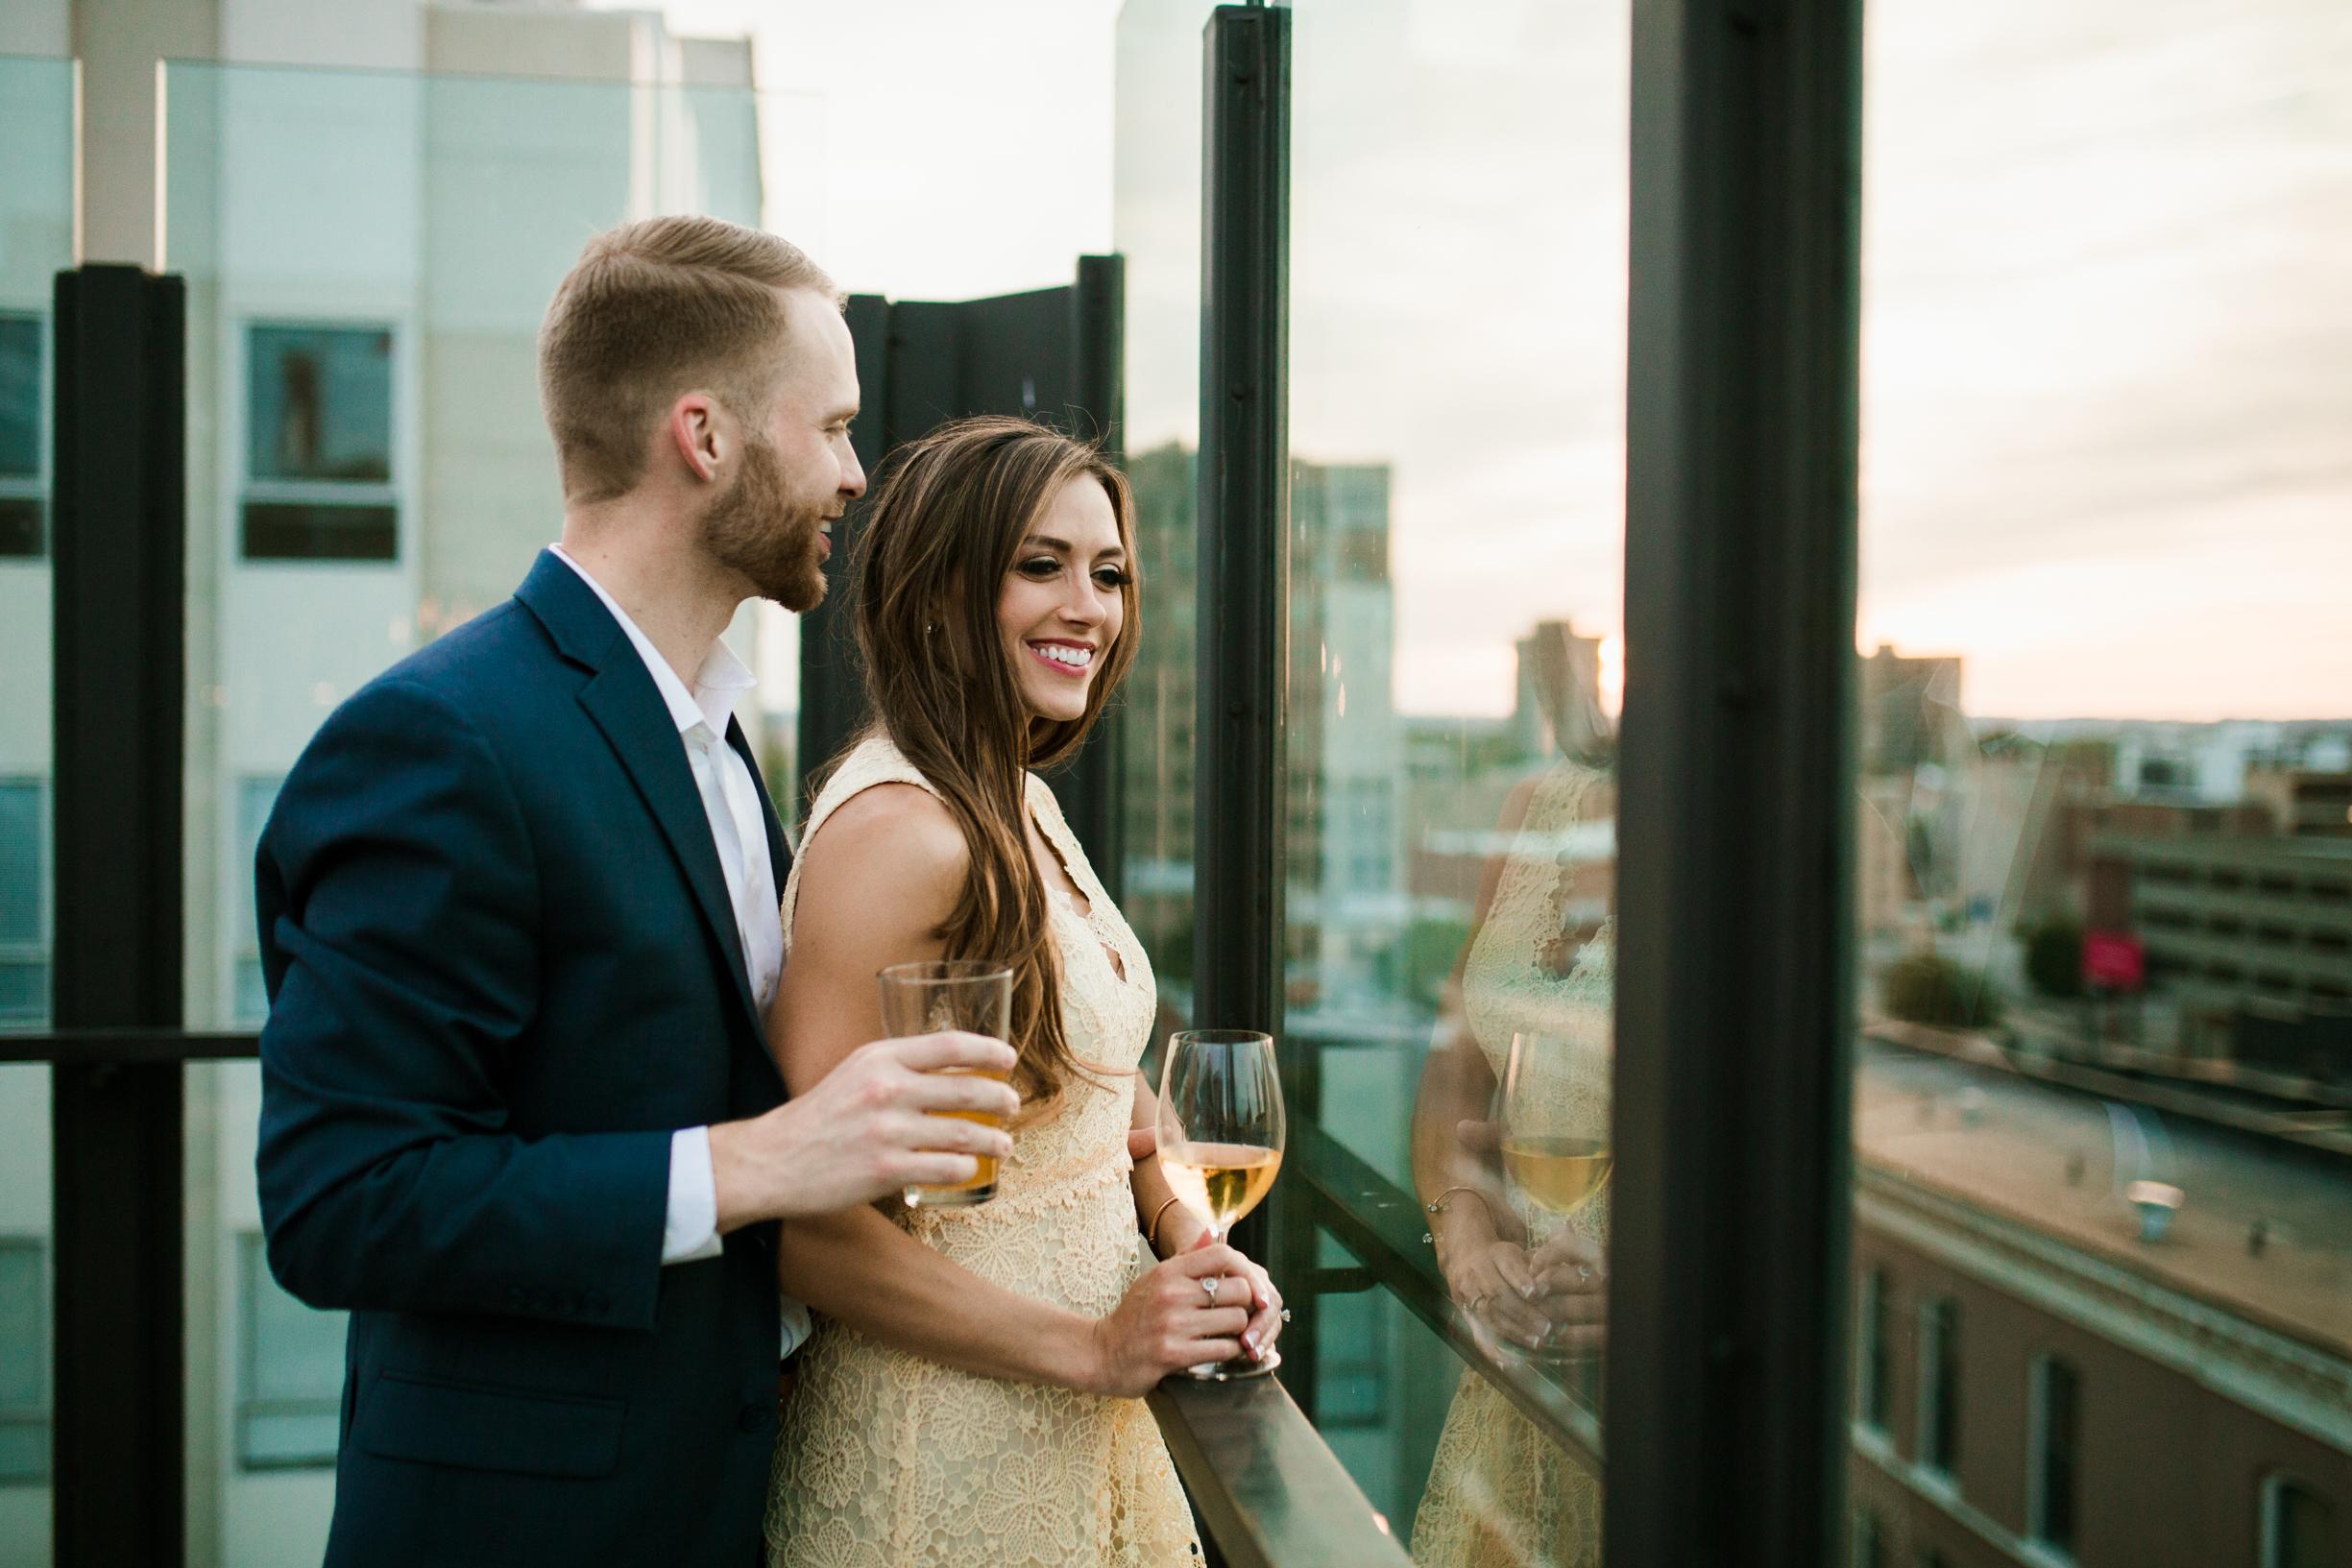 Victoria & Chad Engagement 2018 Crystal Ludwick Photo Louisville Kentucky Wedding Photographer WEBSITE (8 of 48).jpg